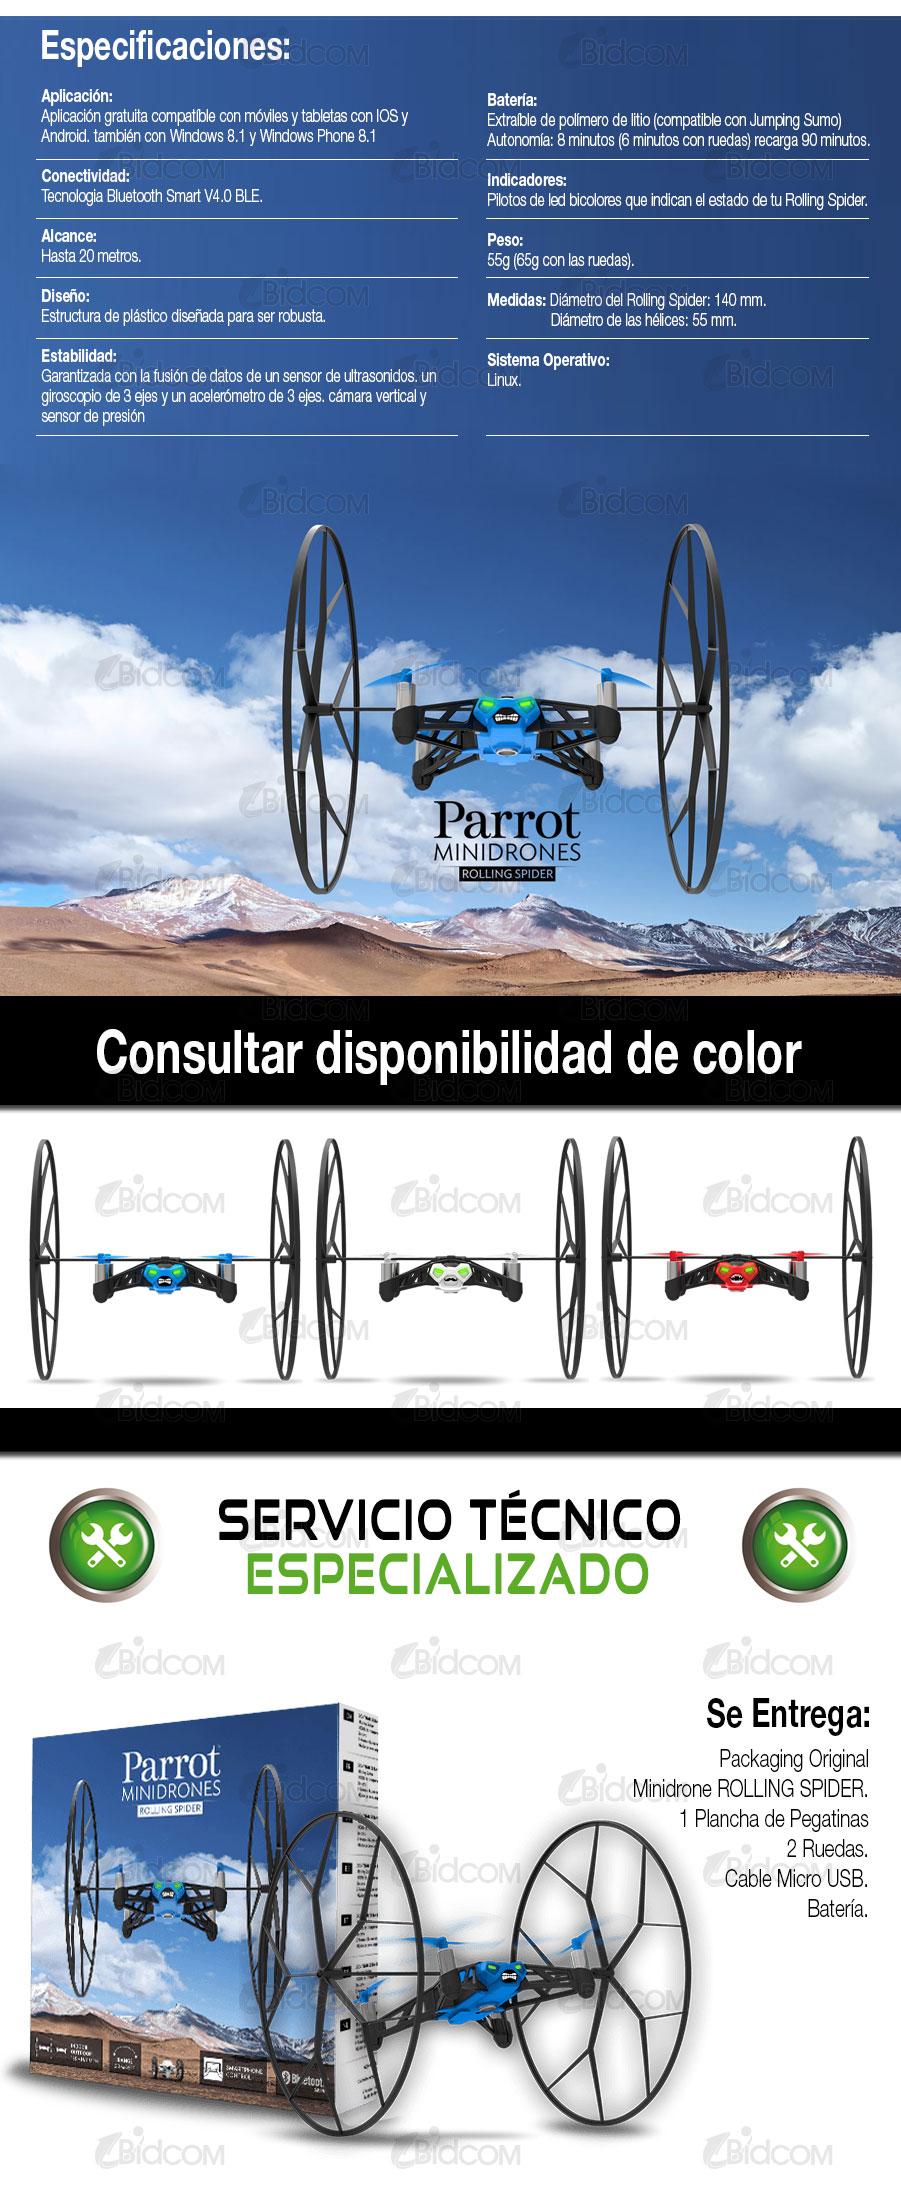 Parrot MiniDrones | Rolling Spider